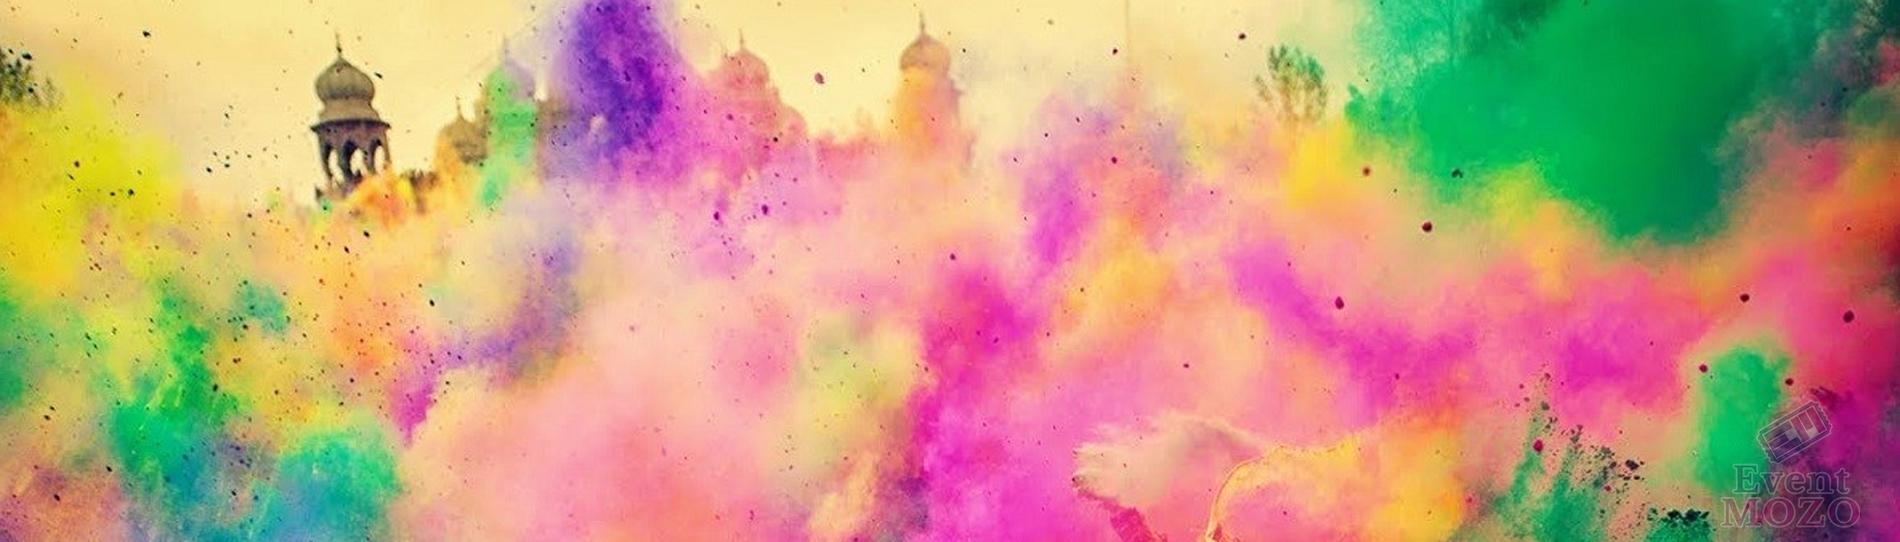 EventMozo Induz Holi - Festival of Colors